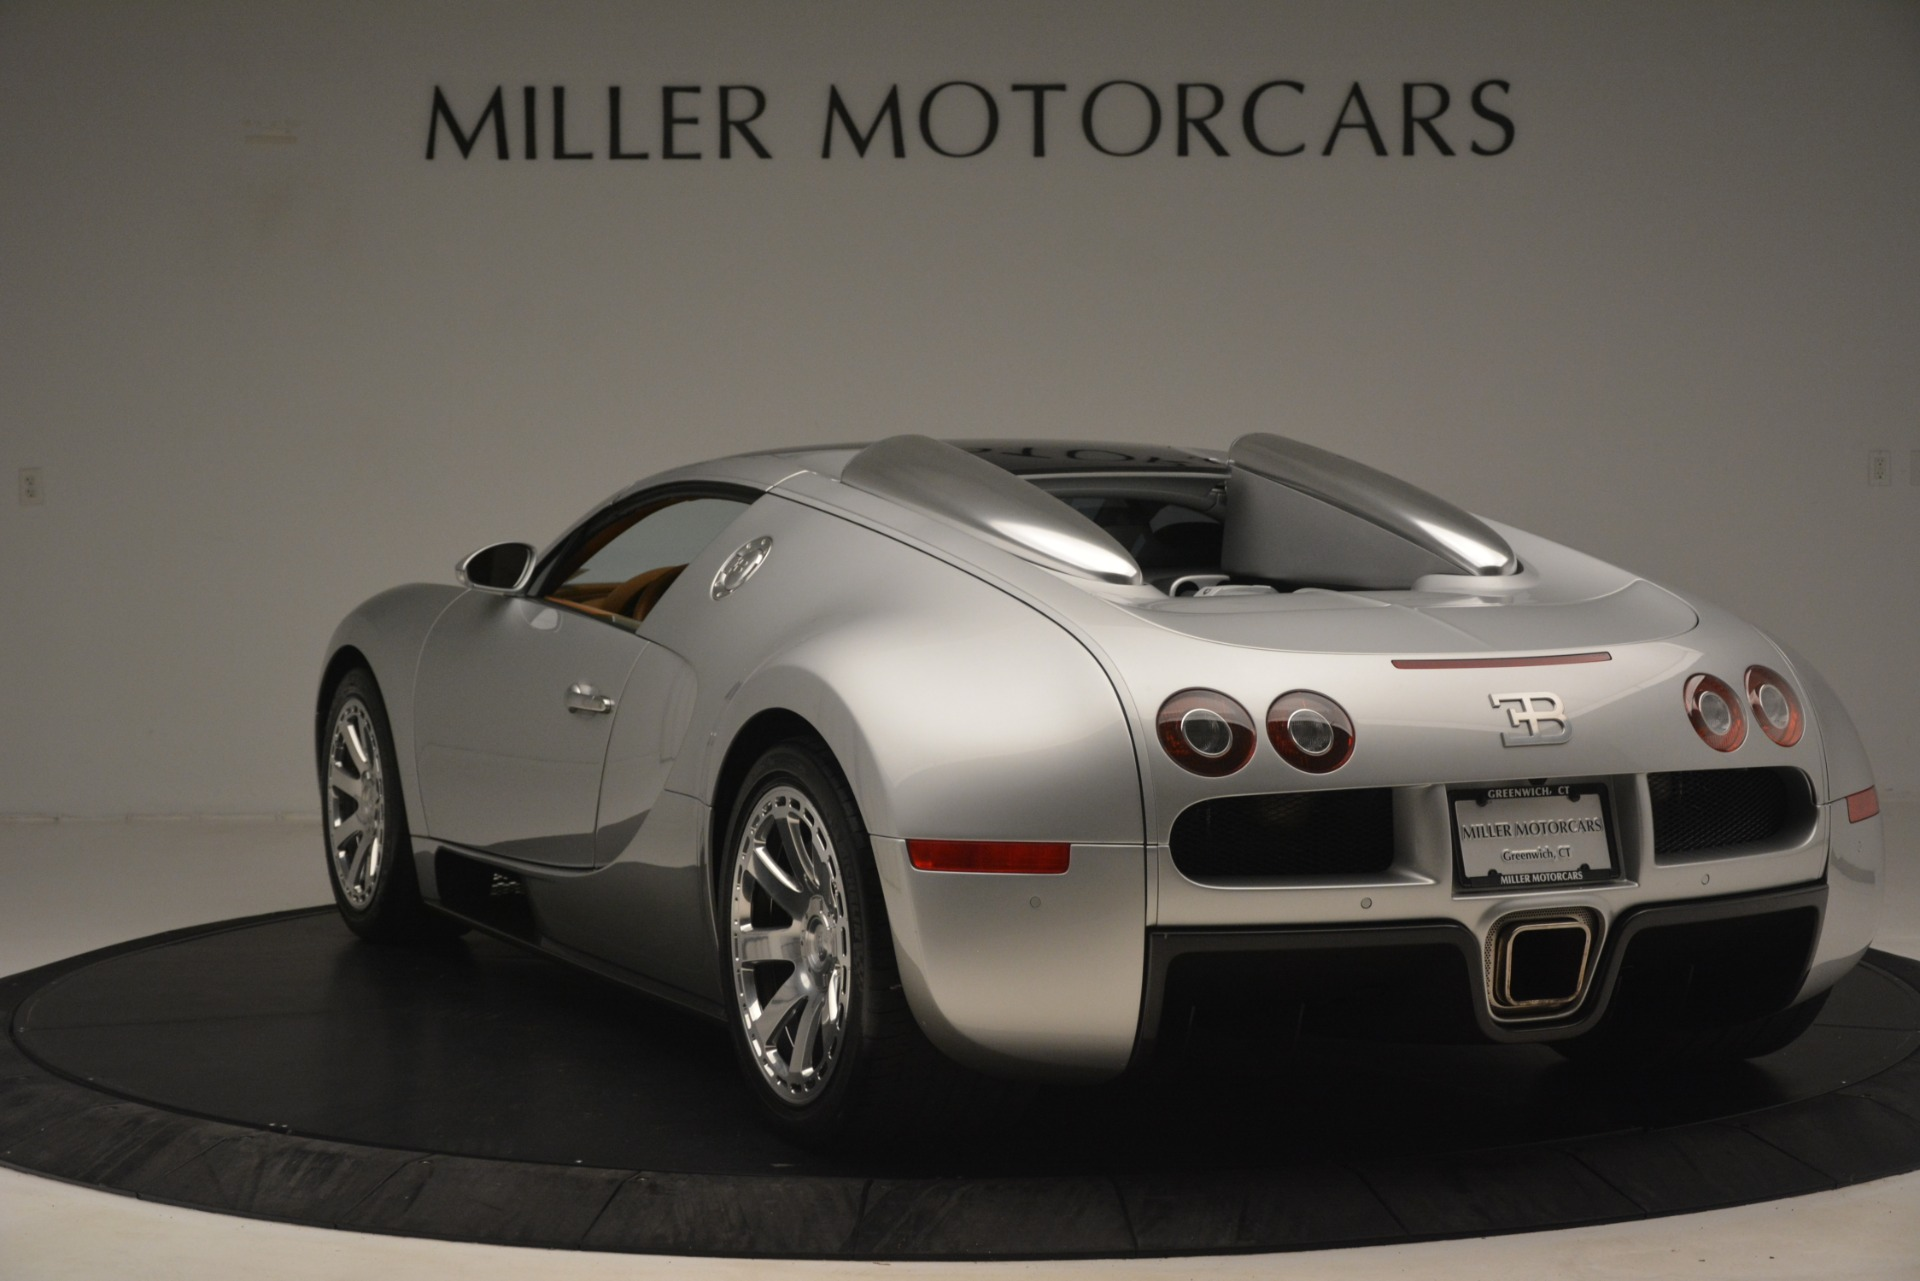 Used 2010 Bugatti Veyron 16.4 Grand Sport For Sale In Greenwich, CT 3159_p15